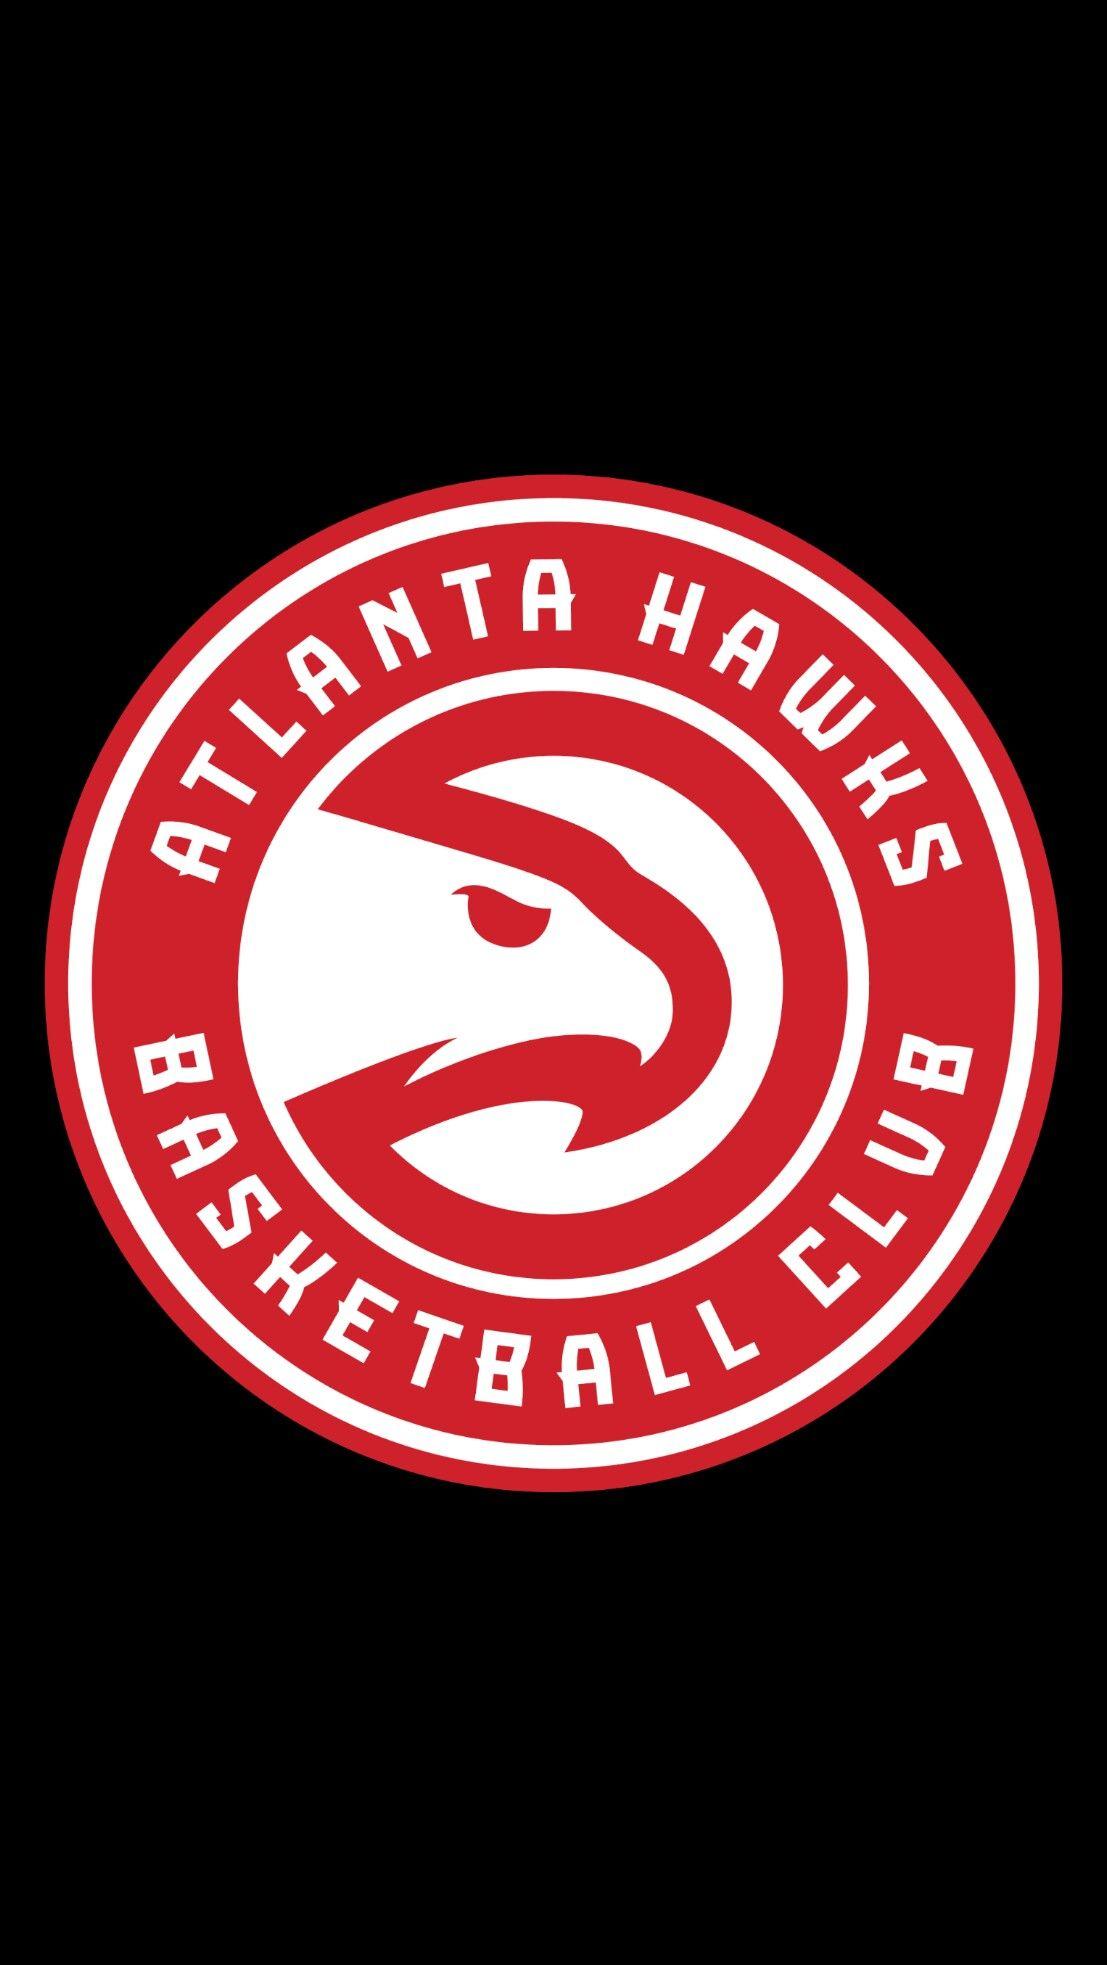 Nba Wallpaper Iphone Android Atlanta Hawks Sports Team Logos Atlanta